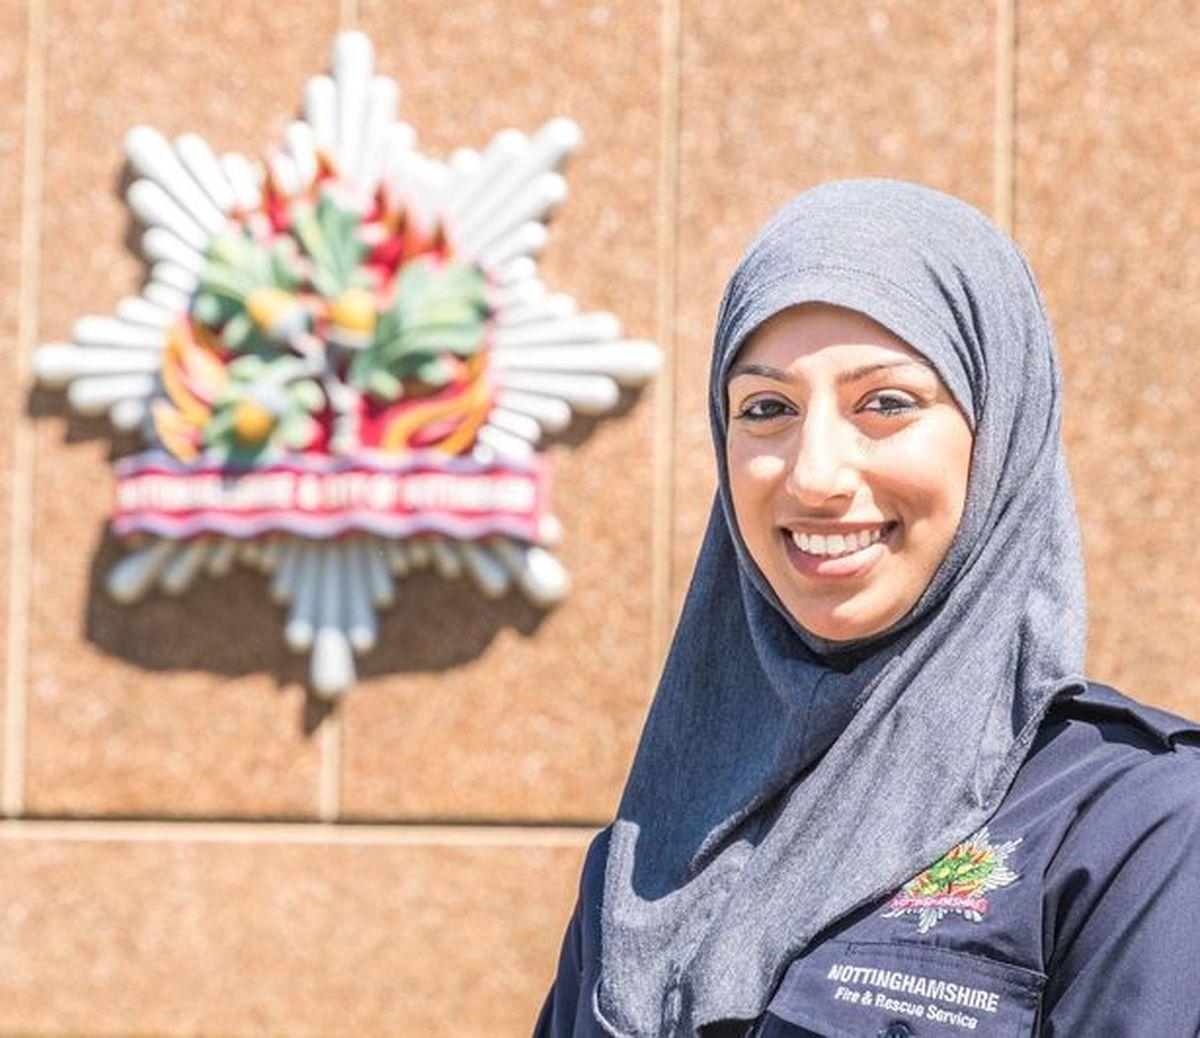 ناتینگهام انگلیس  | اولین آتش نشان زن مسلمان در انگلیس شروع به کار کرد